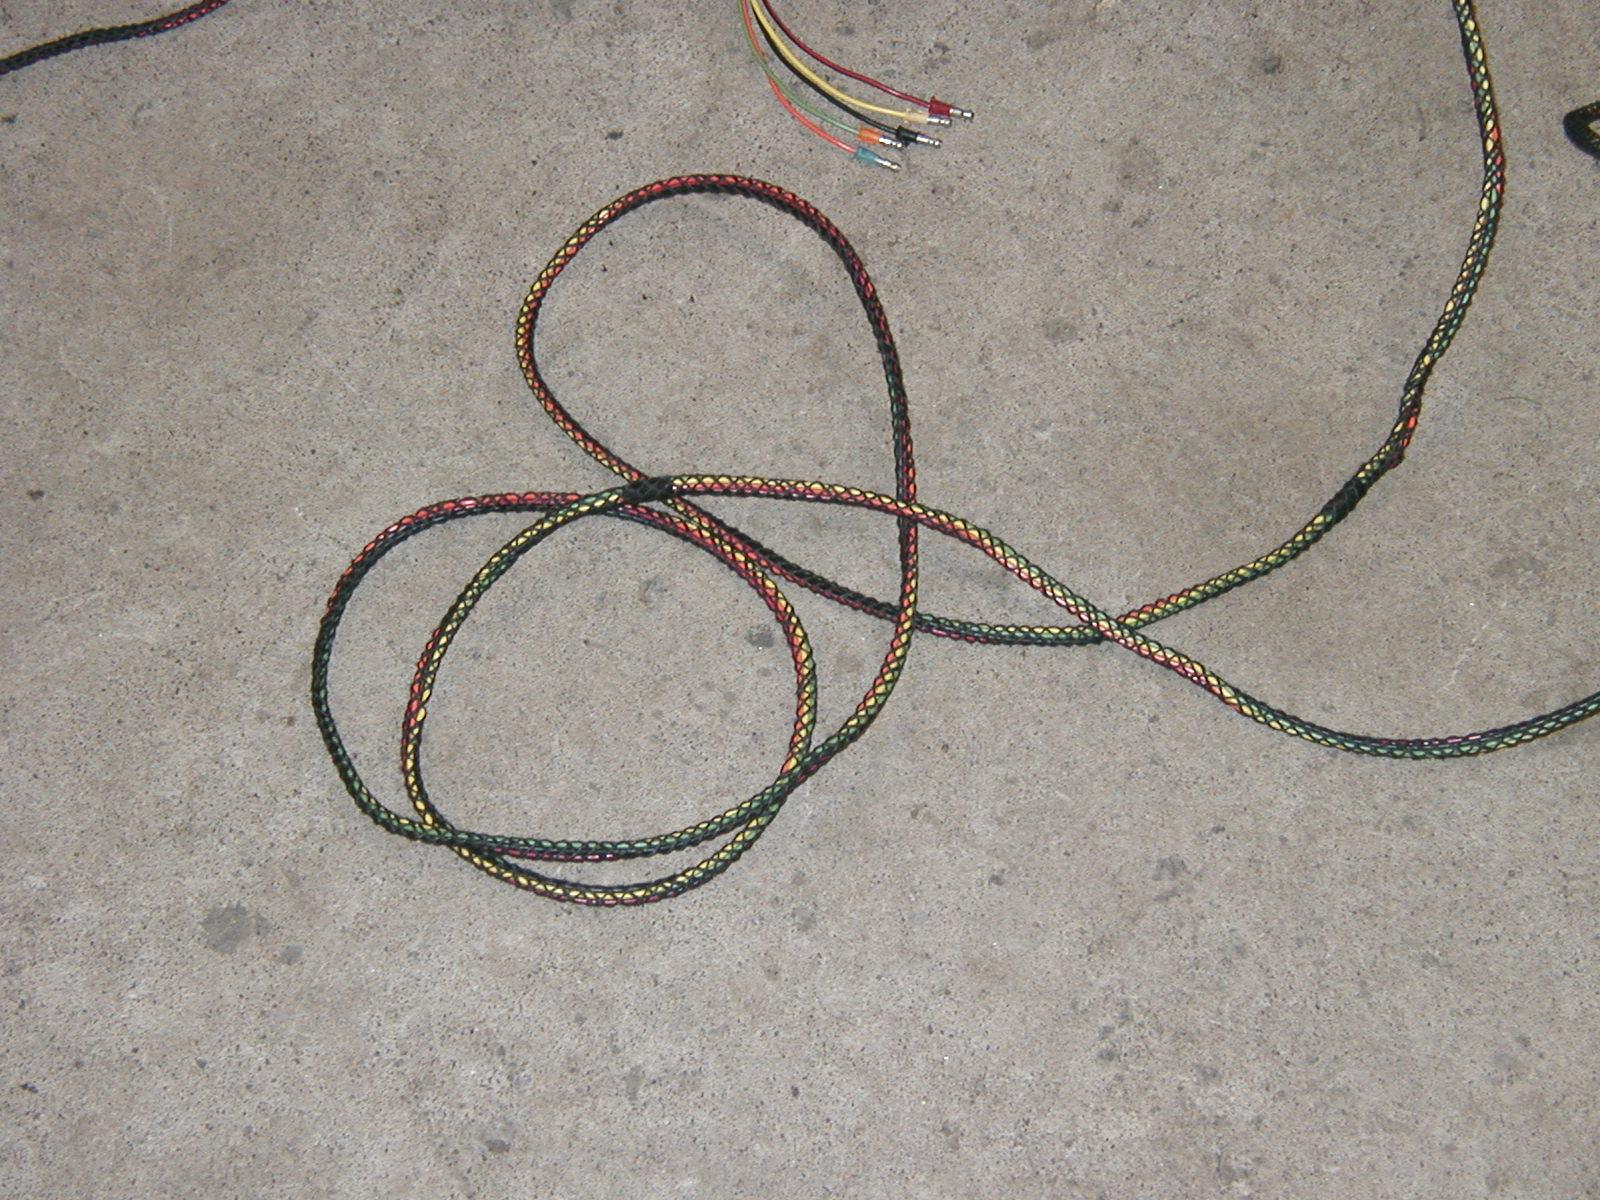 wire harness 004.JPG